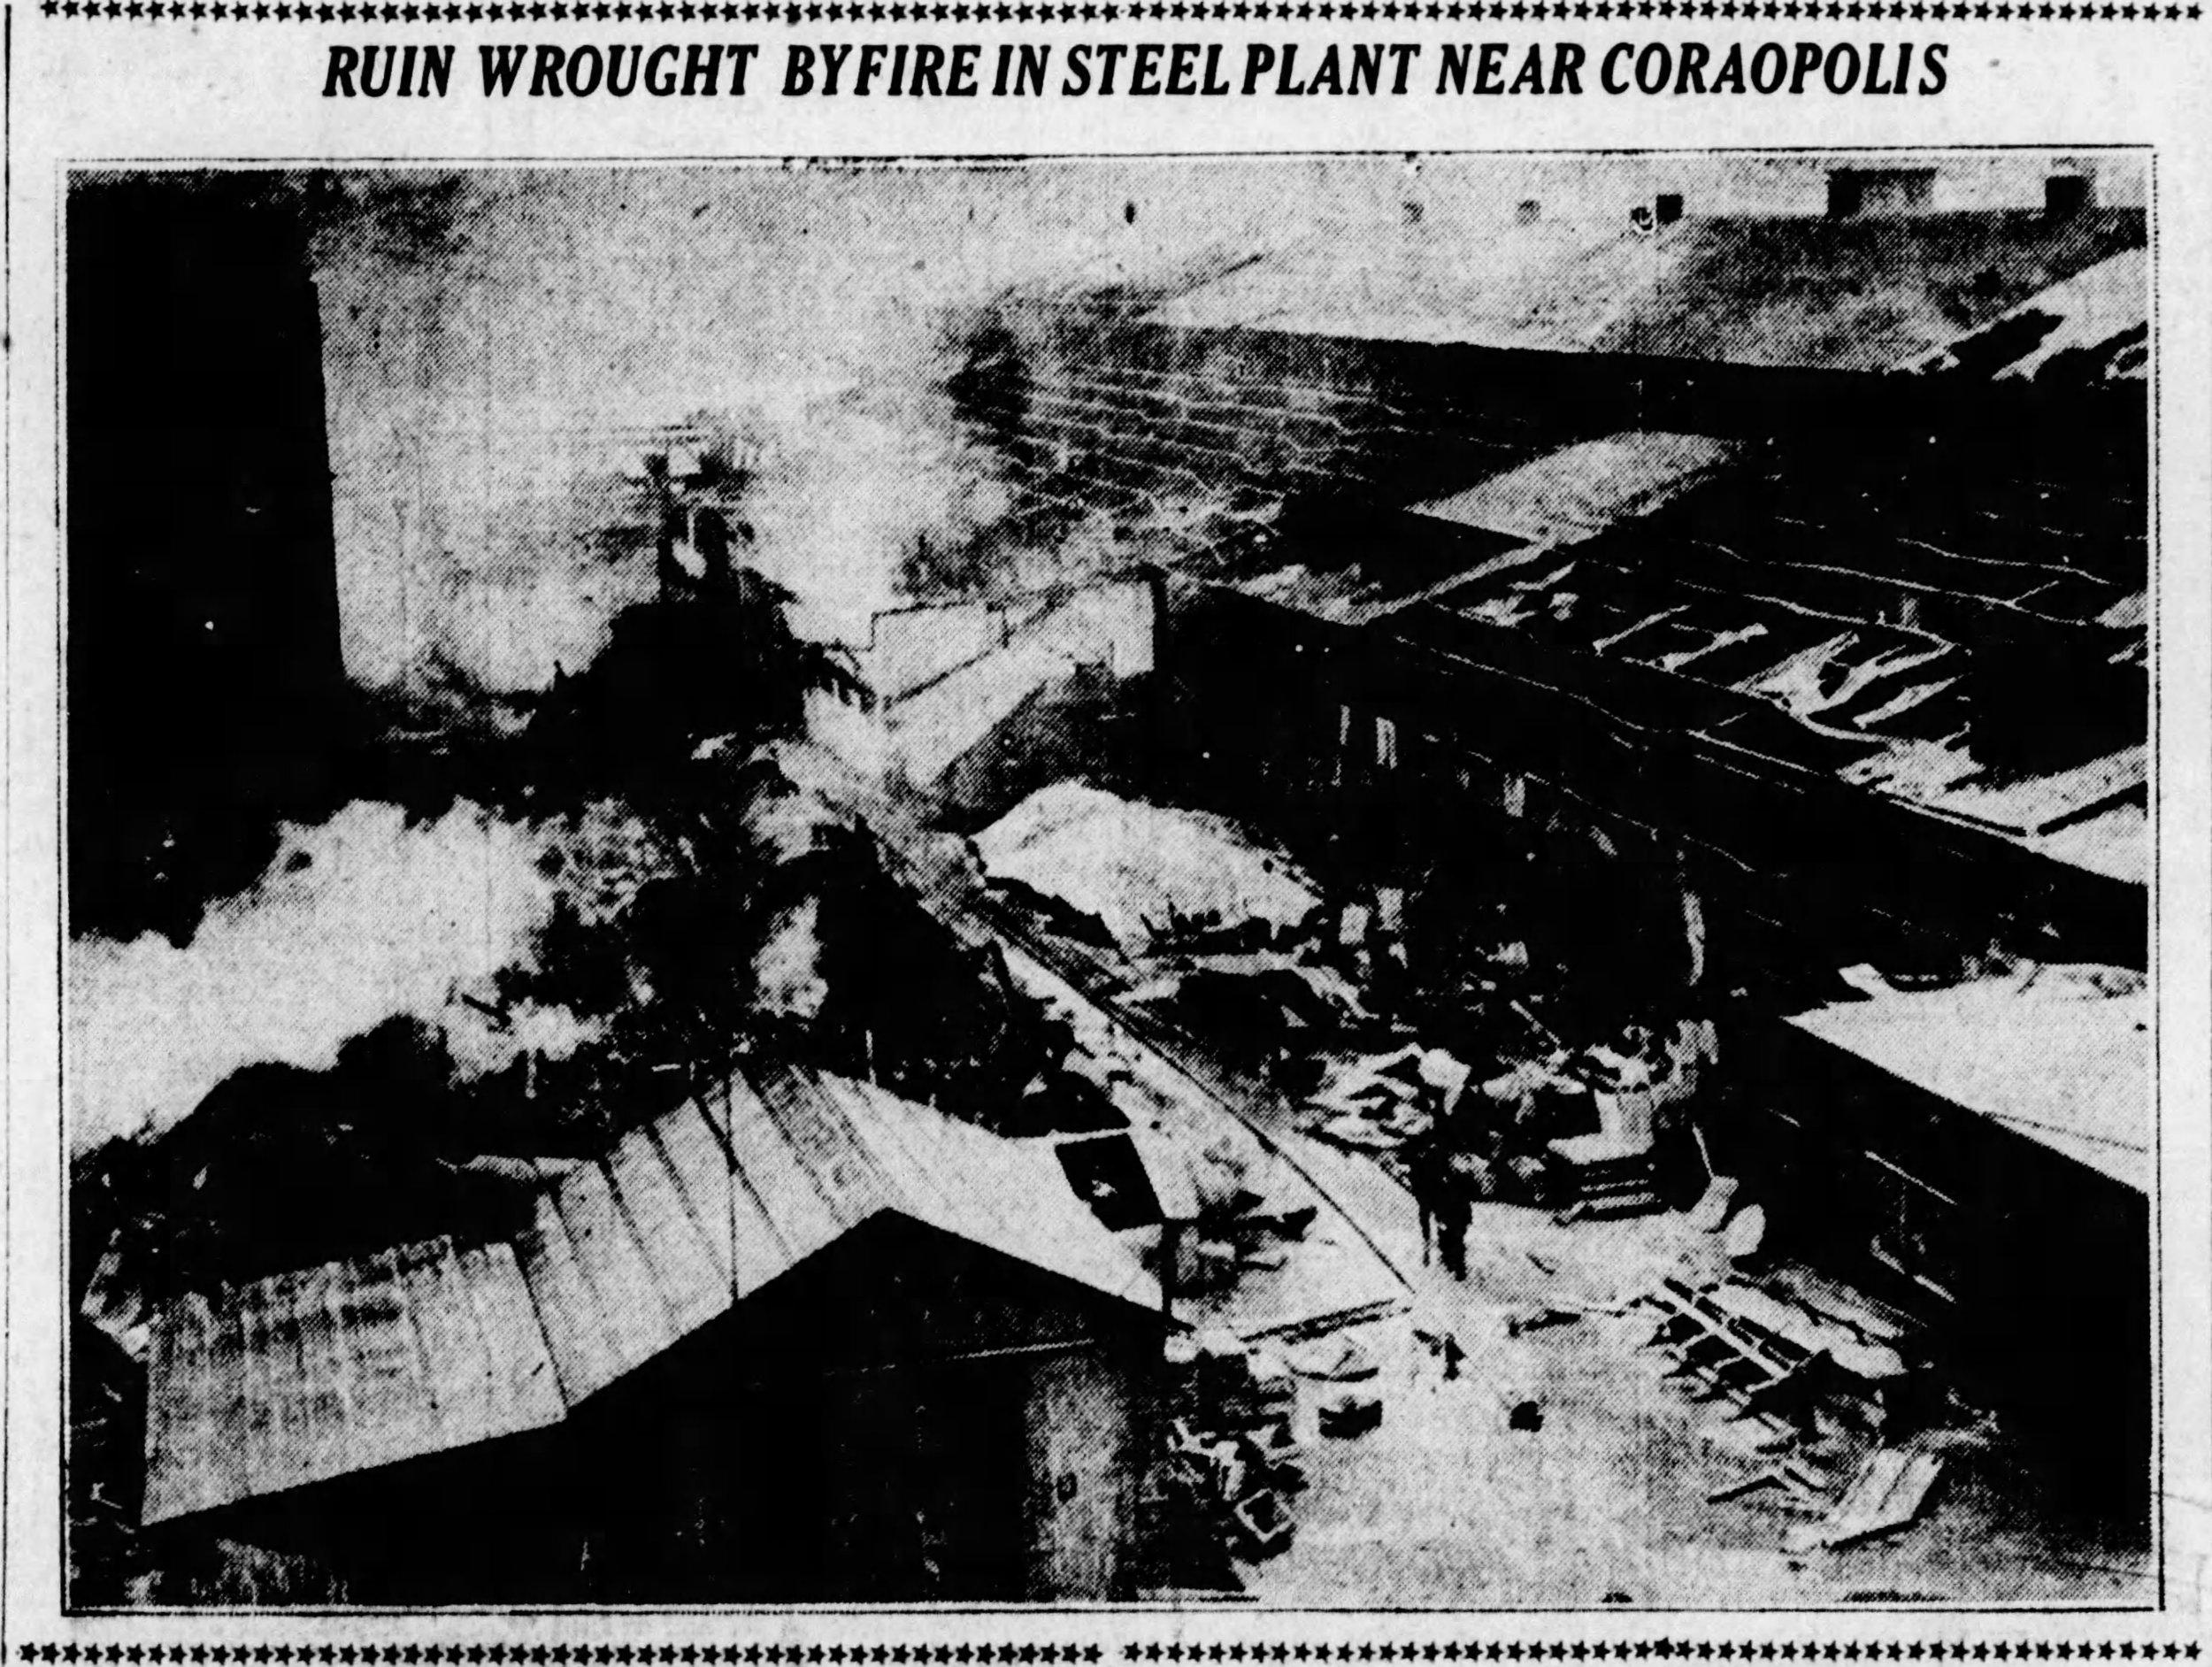 1922-11-21 The Pittsburgh Press (2).jpg